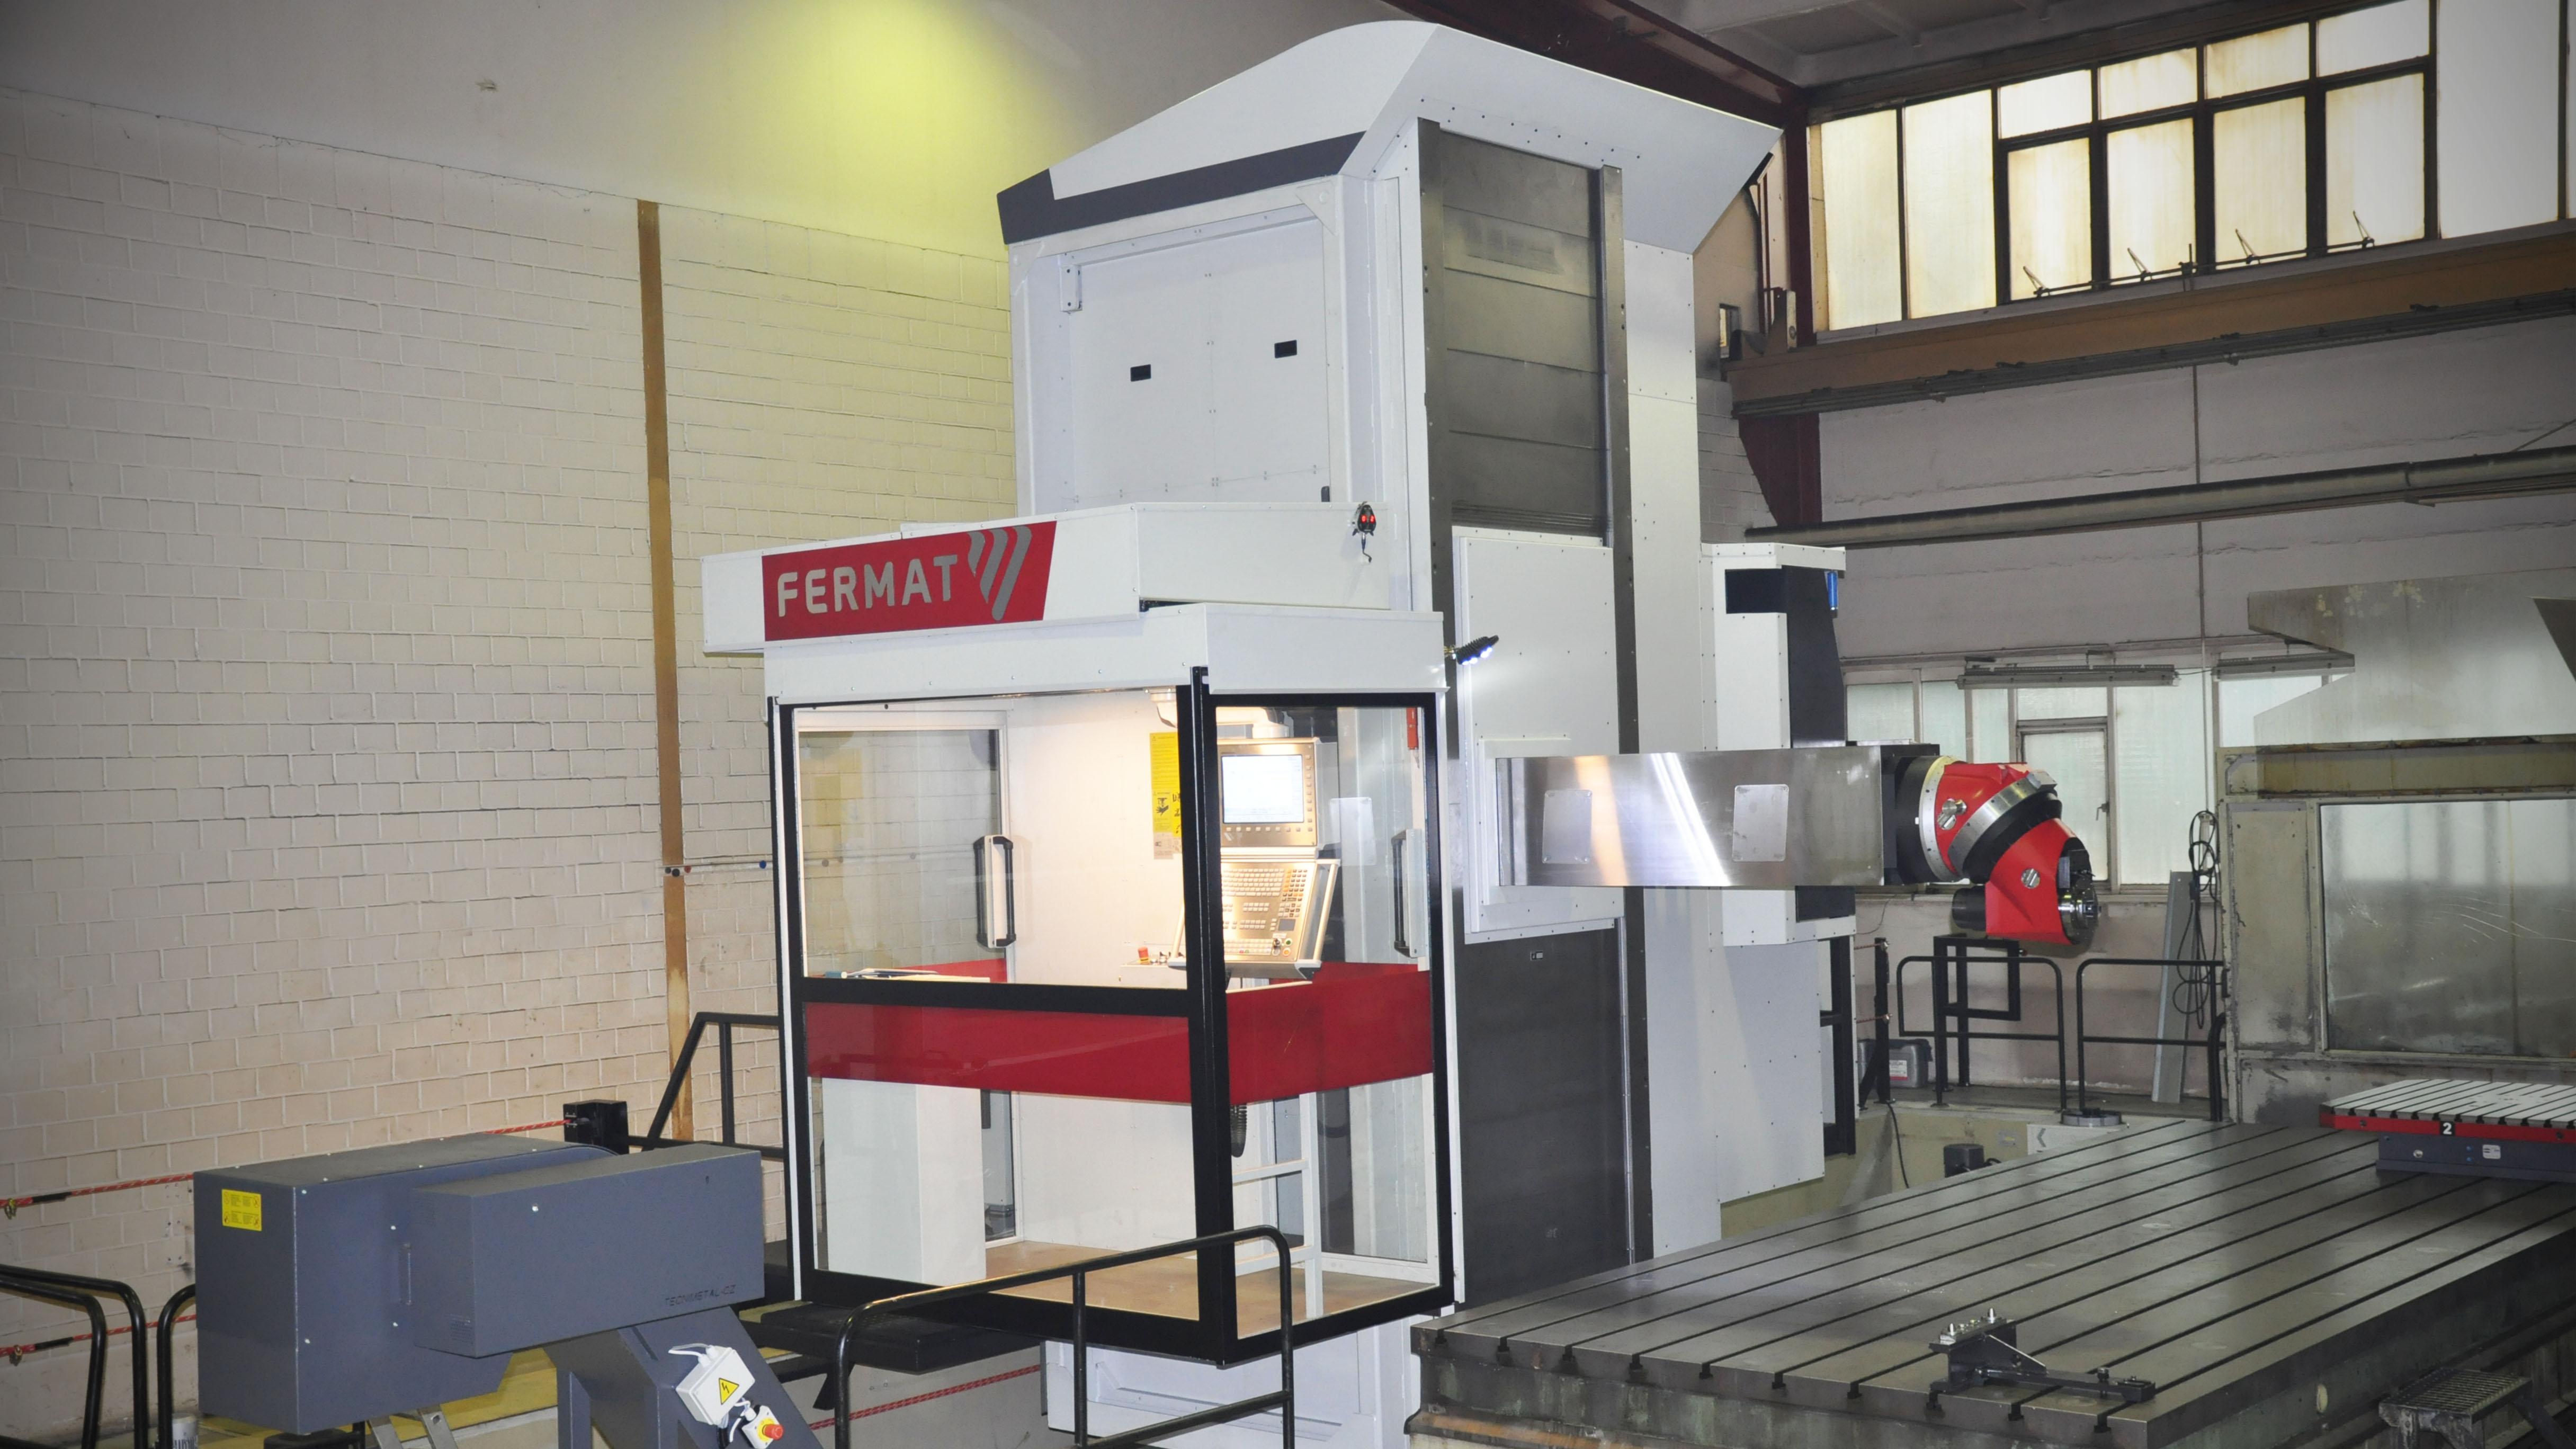 Sondermaschinenbau Calvörde GmbH - Image